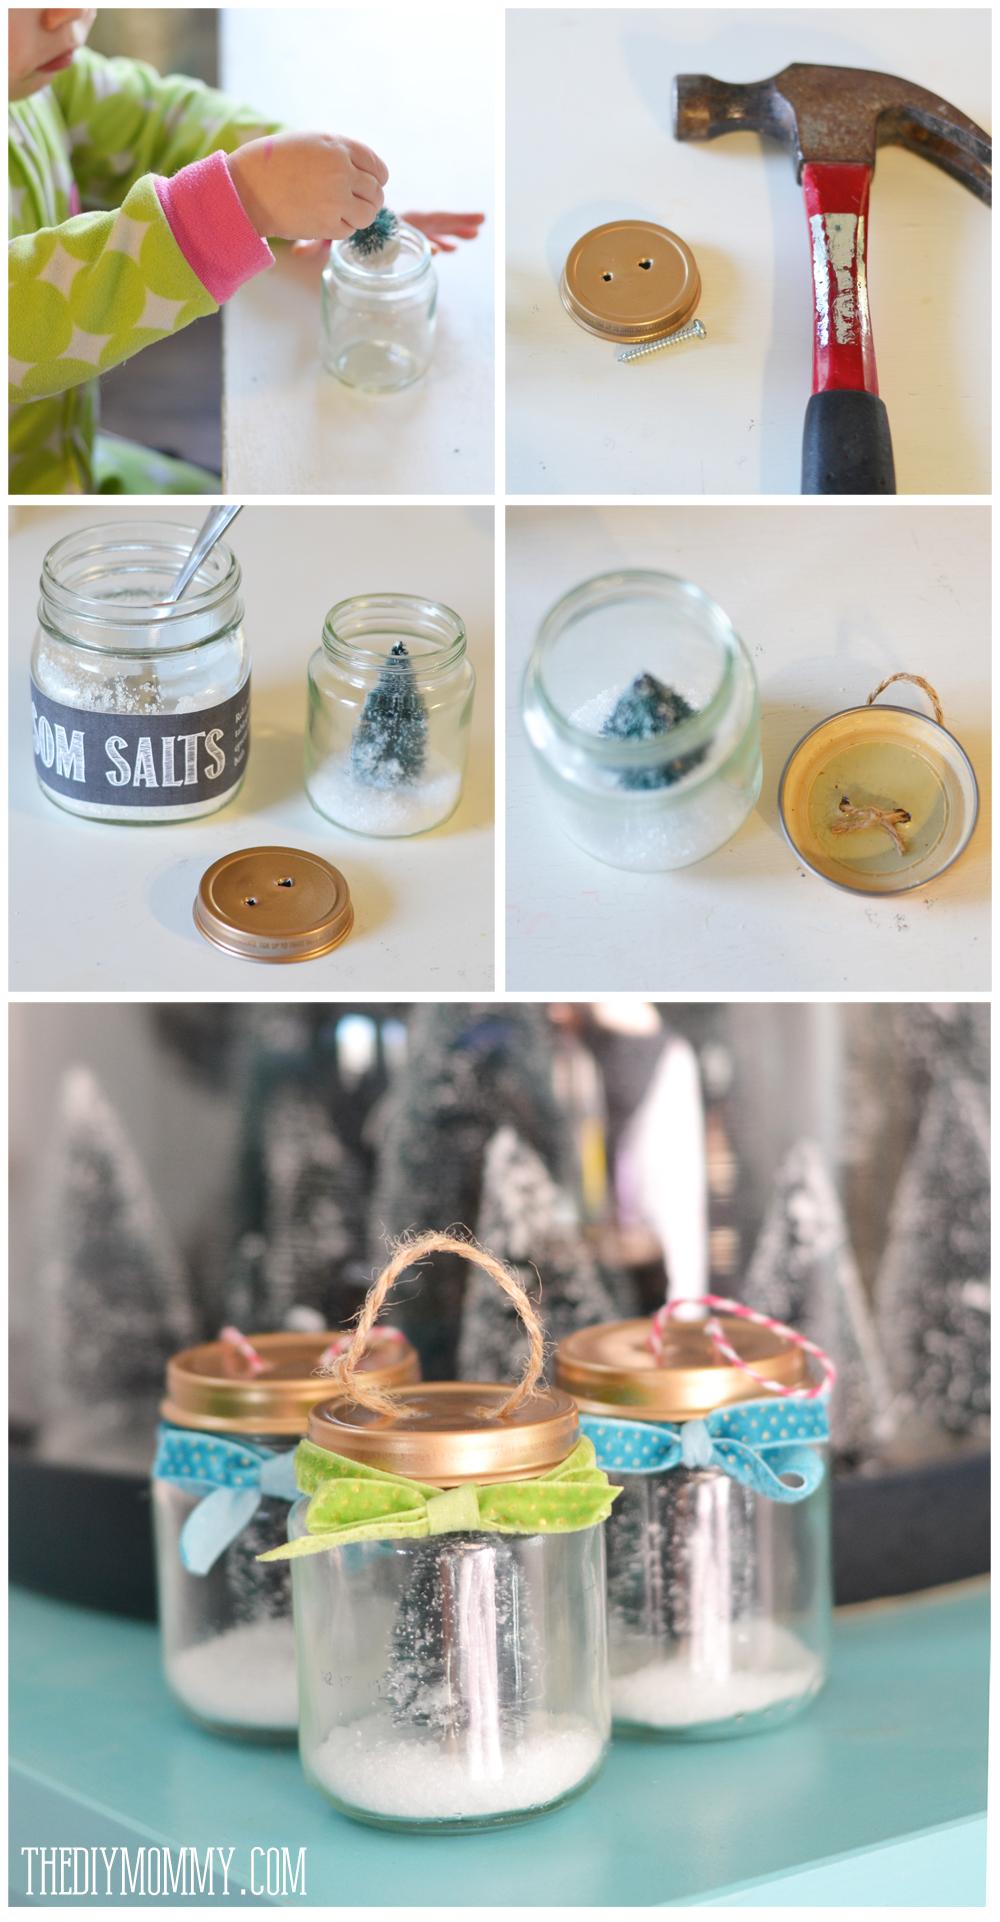 Decorated Baby Food Jars